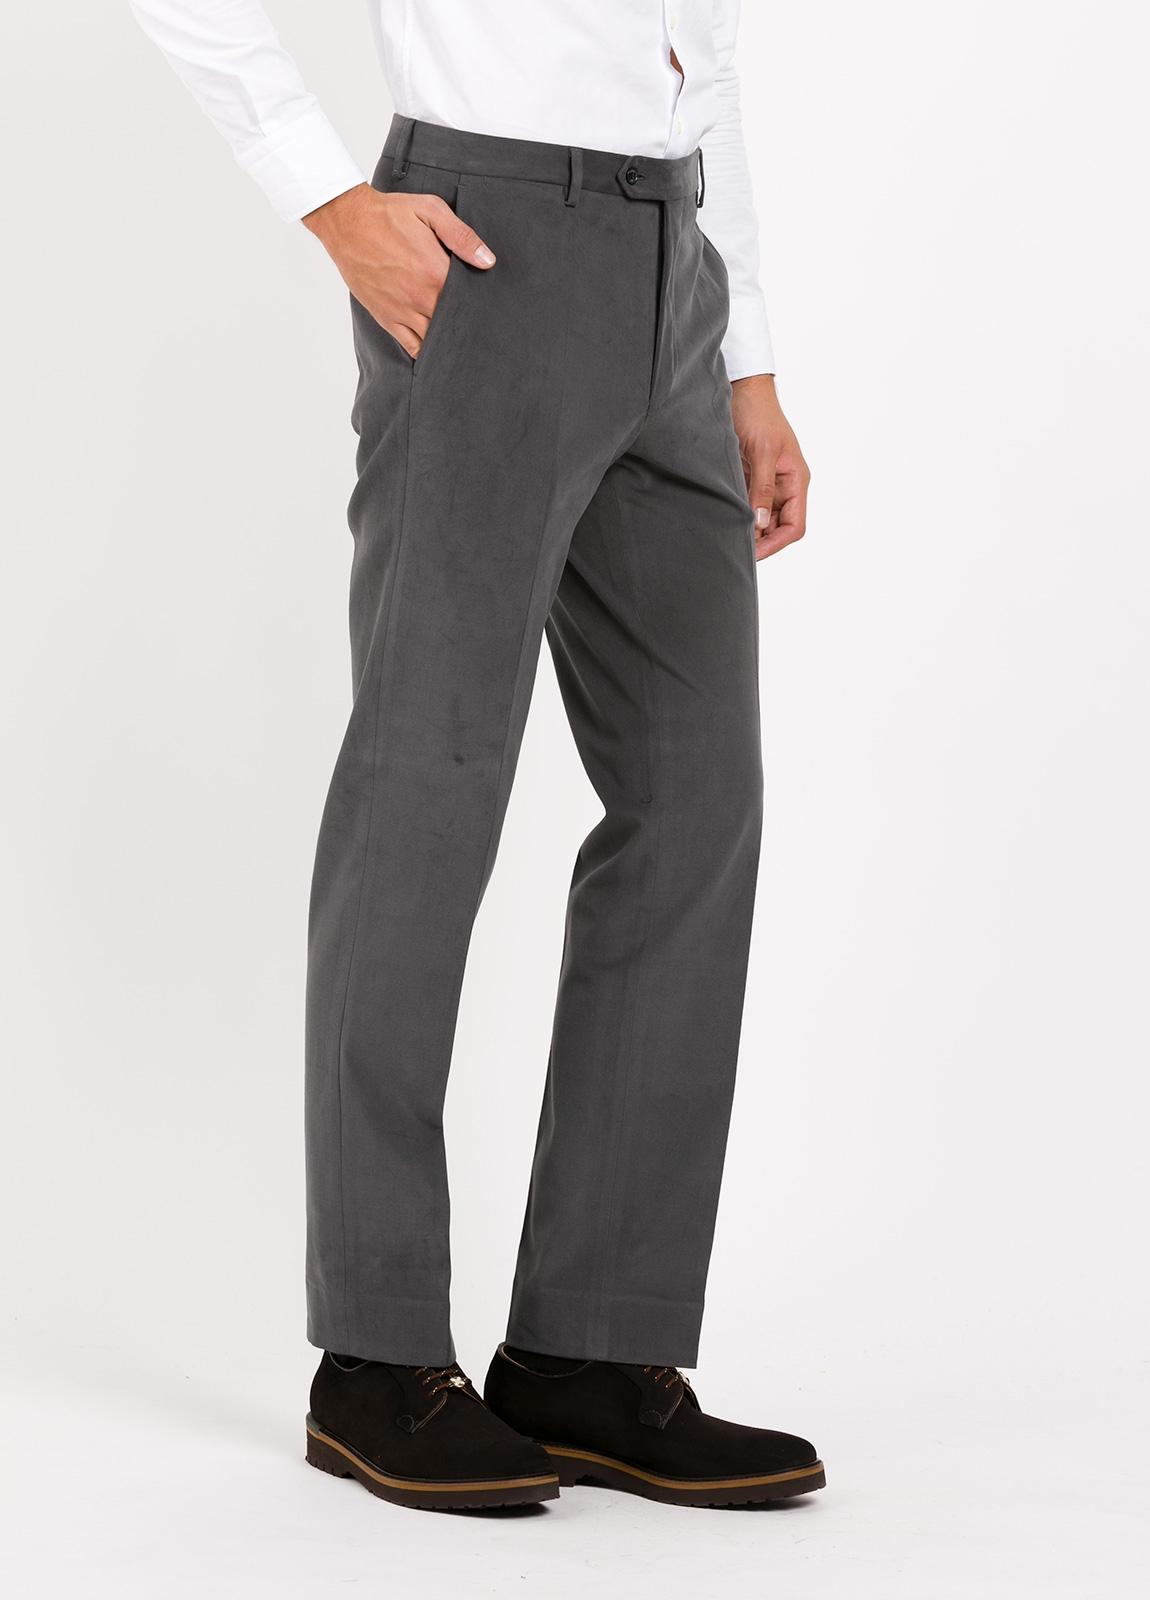 Pantalón vestir de algodón Regular Fit, color gris oscuro. 98% Algodón, 2% Ea. - Ítem1